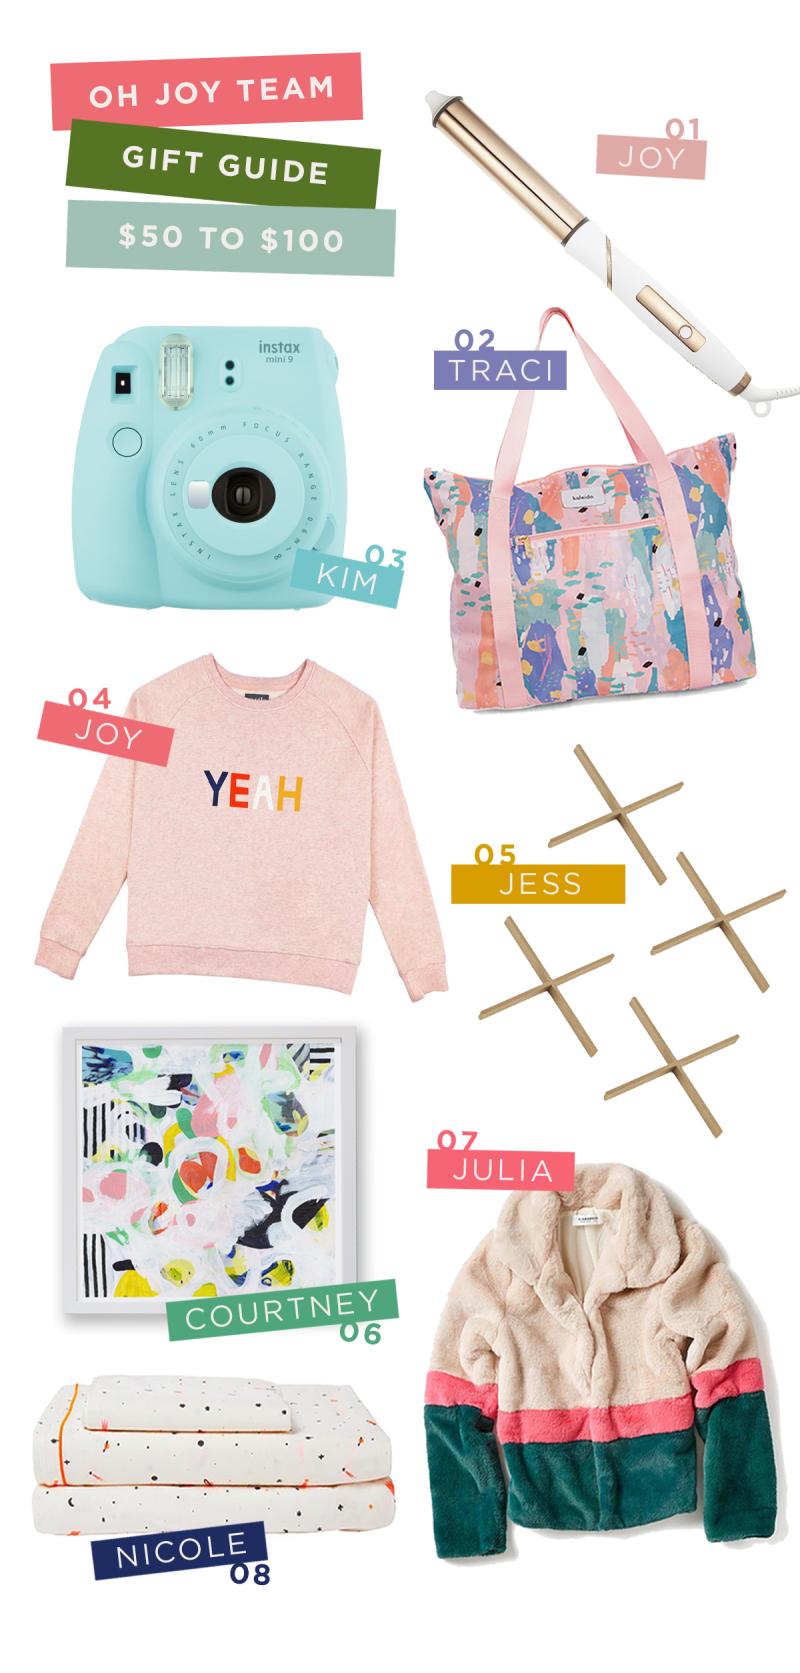 Oh Joy Team Gift Guide: $50 to $100: Joy, Traci, Kim, Jess, Julia, Courtney, Nicole / via Oh Joy!